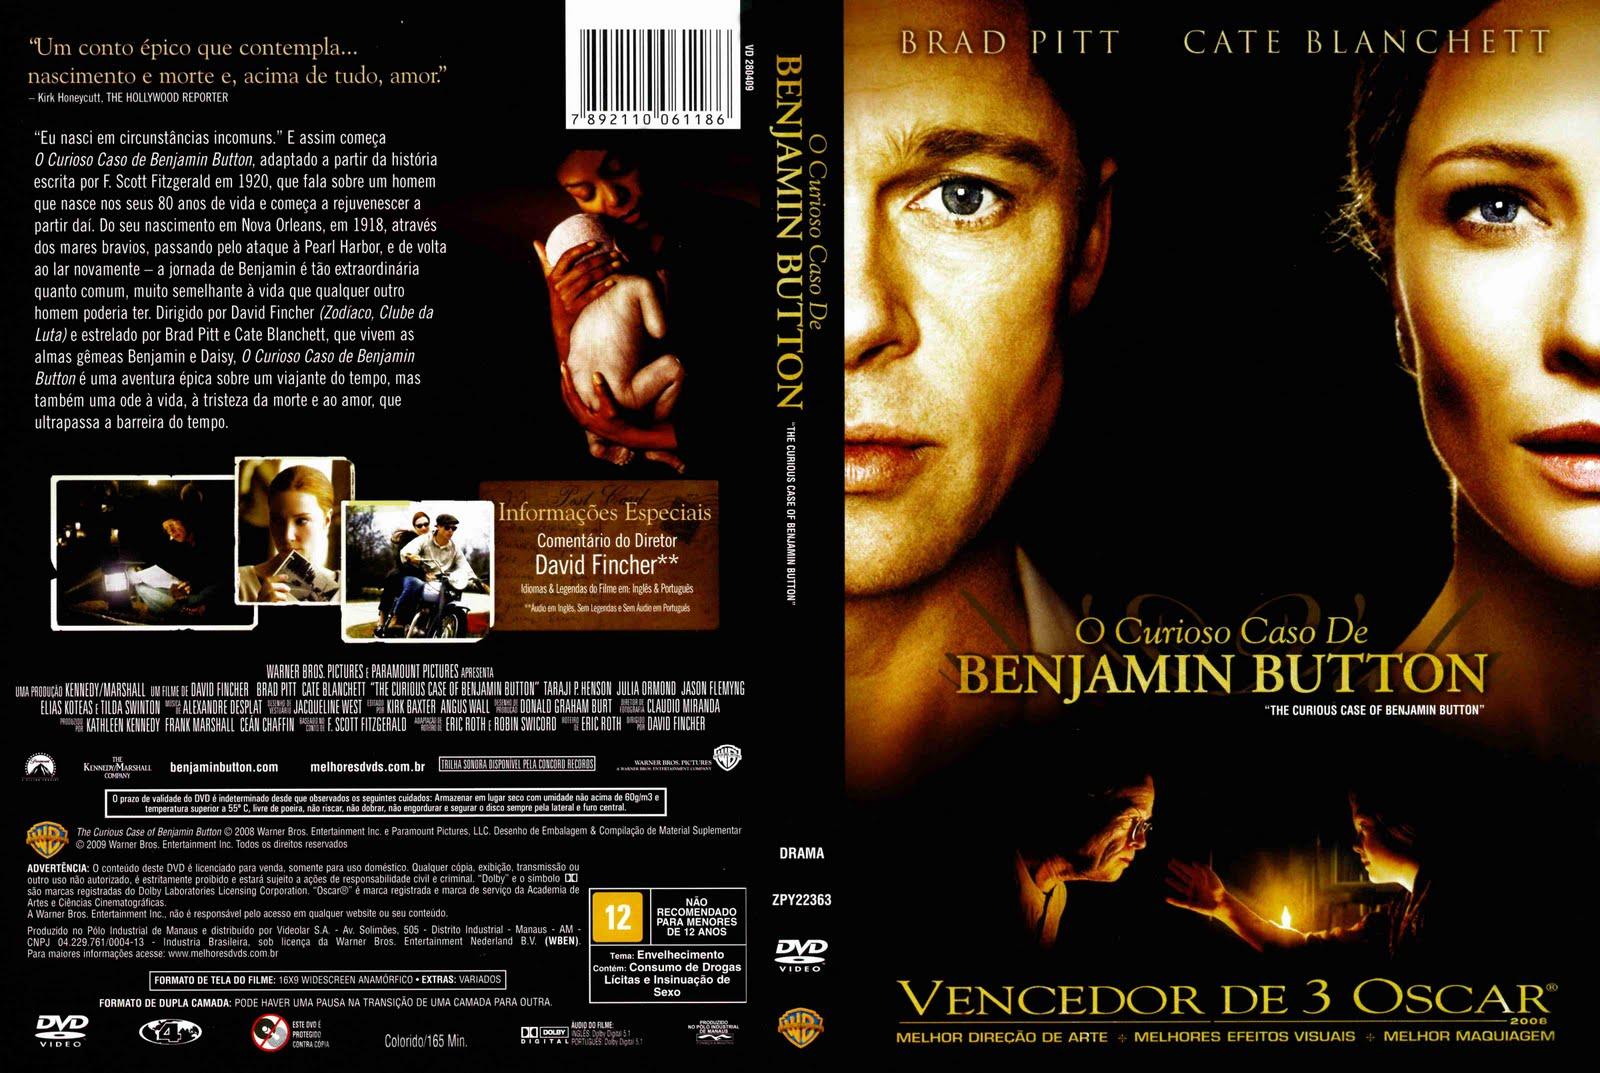 Dj Vini Troca & Venda De Filmes: O Curioso Caso de Benjamin Button